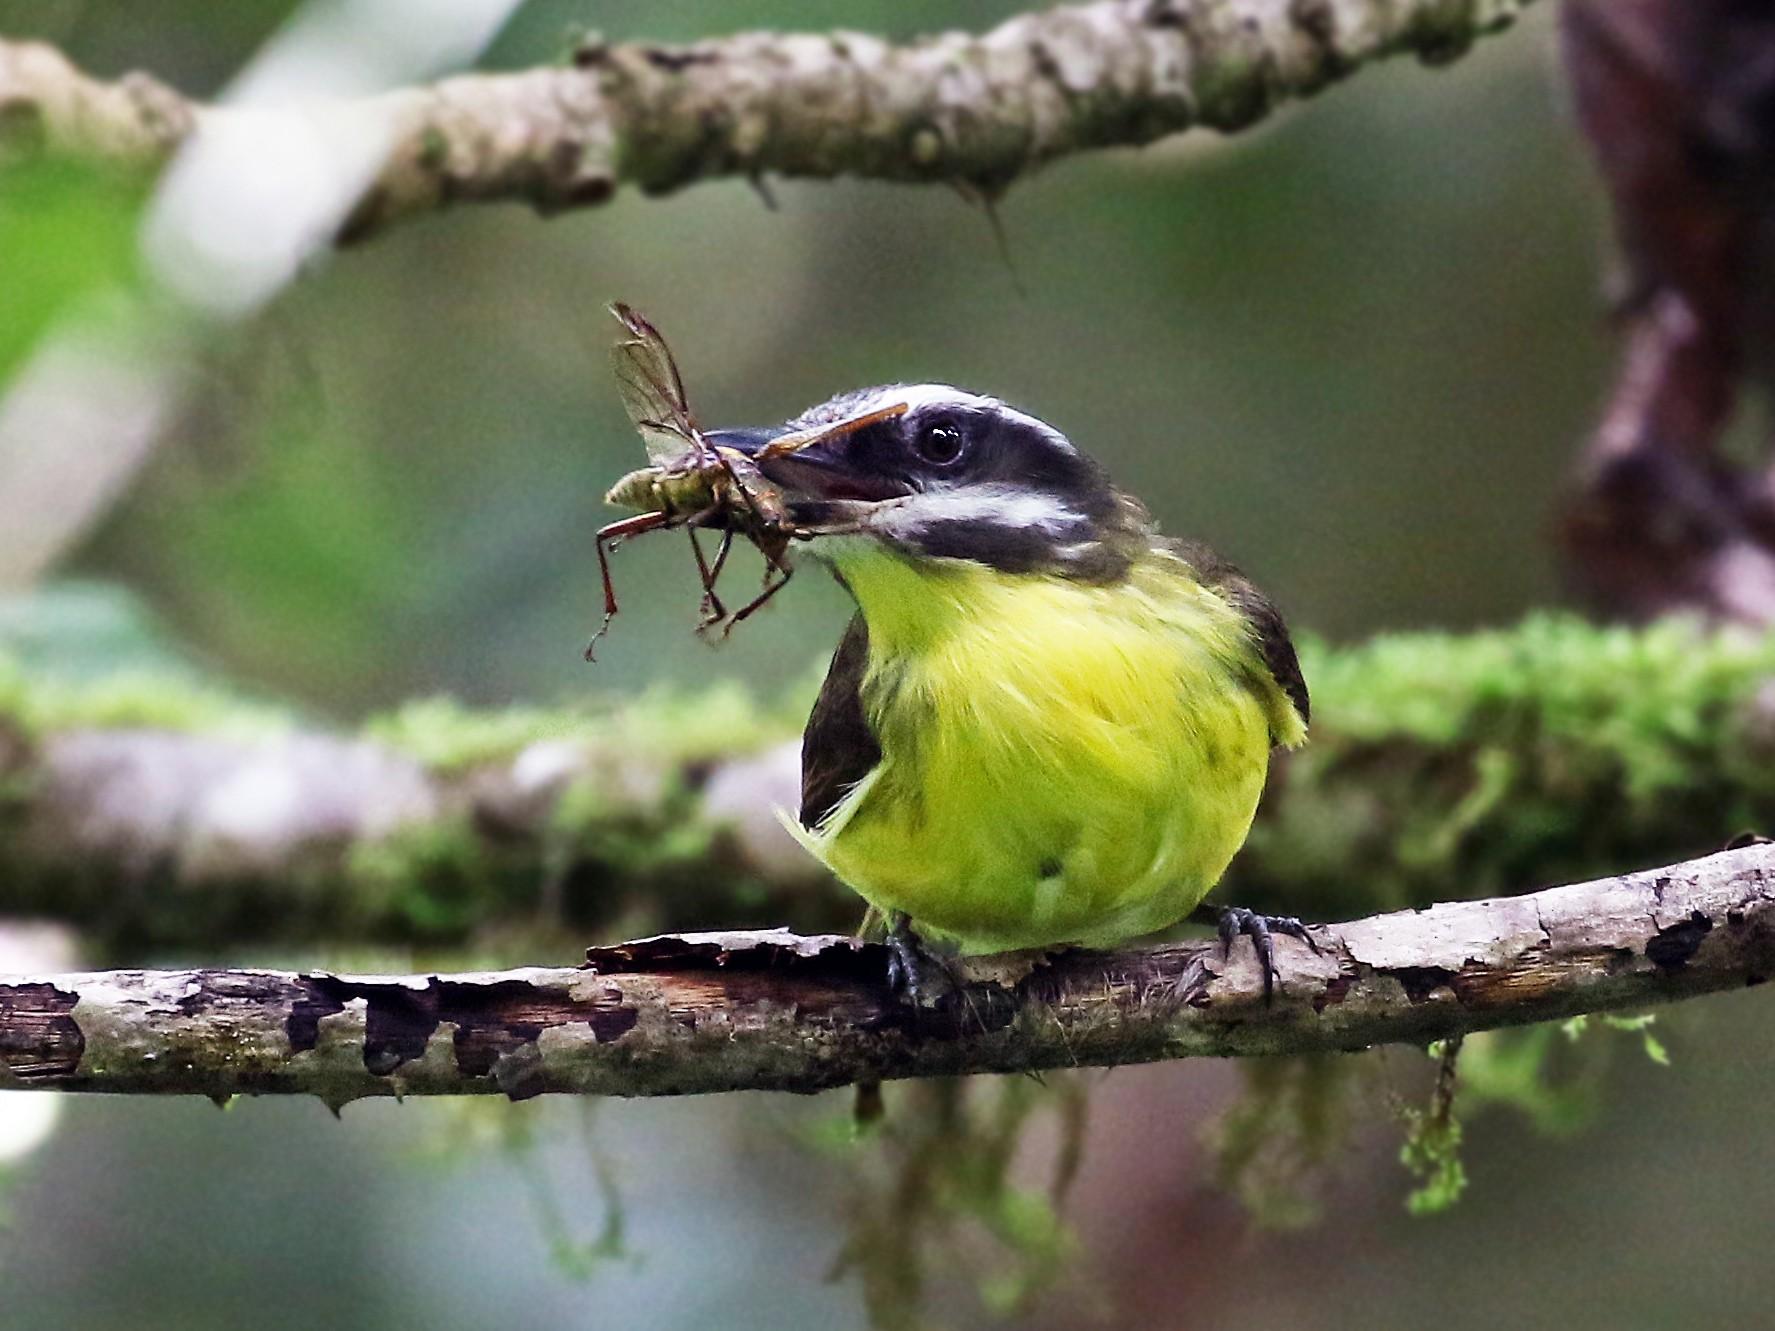 Golden-bellied Flycatcher - Andrew Spencer